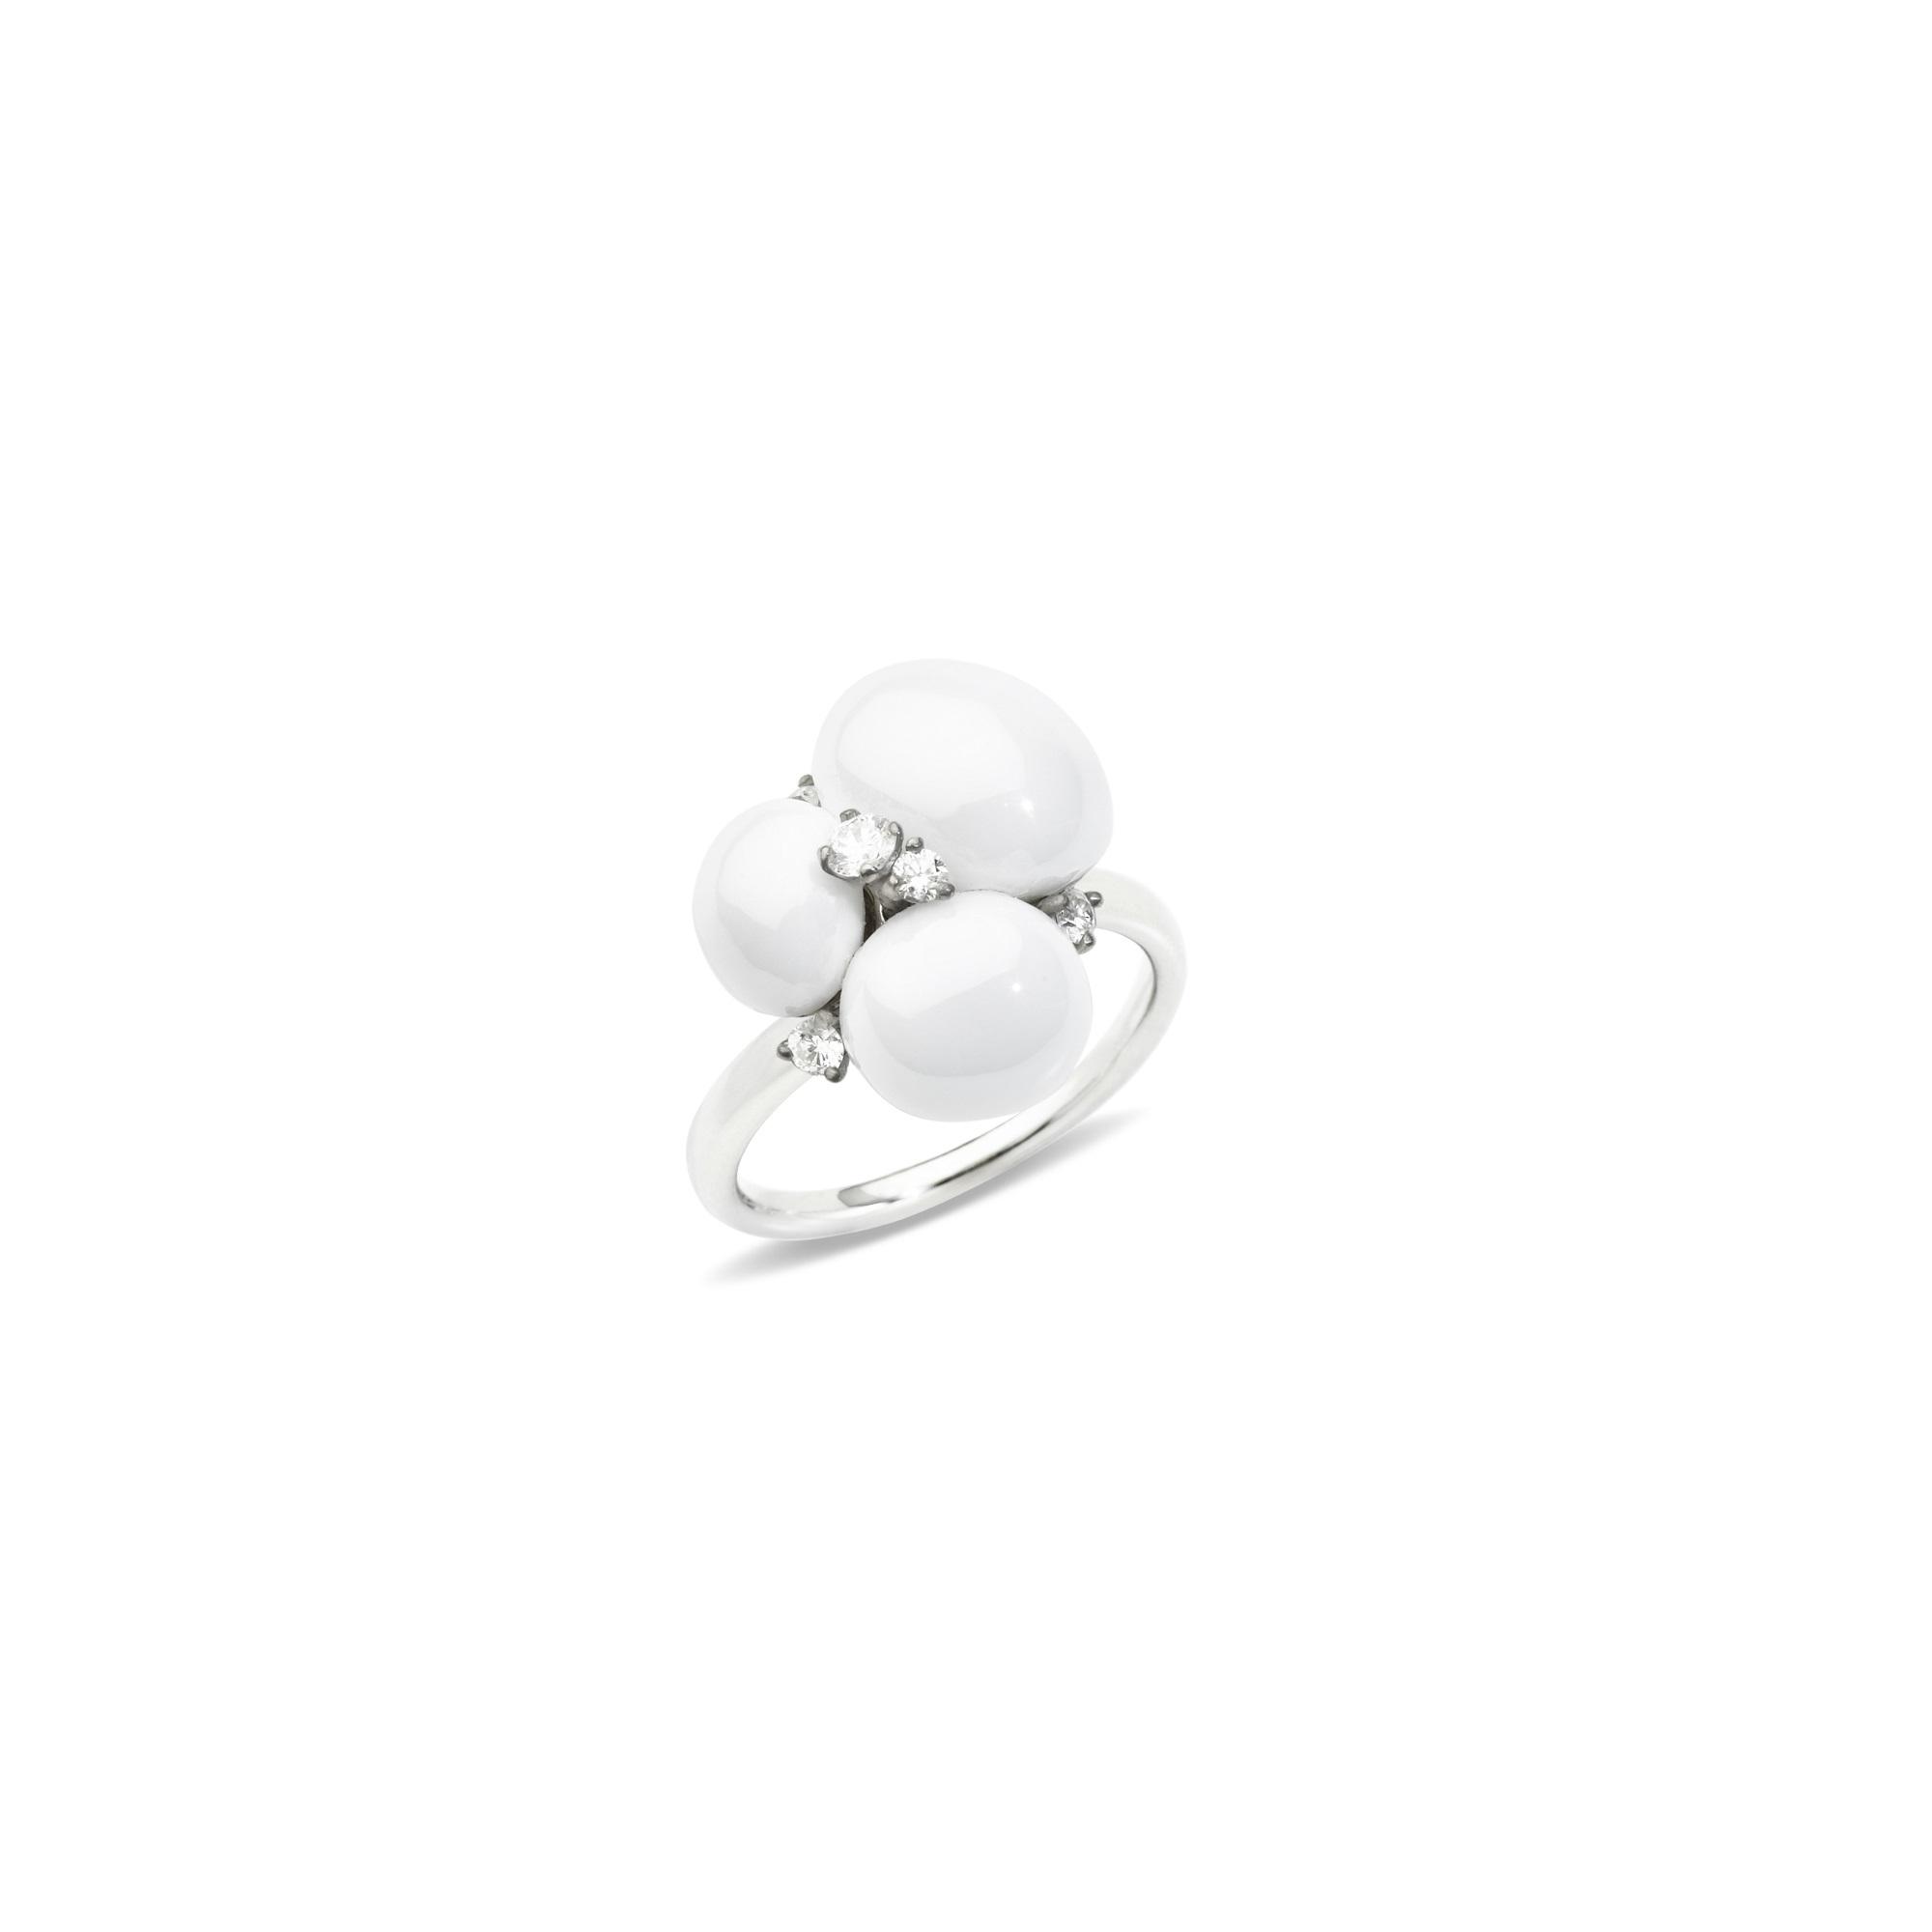 Pomellato Capri Ring aus Weißgold mit Diamanten und Keramik